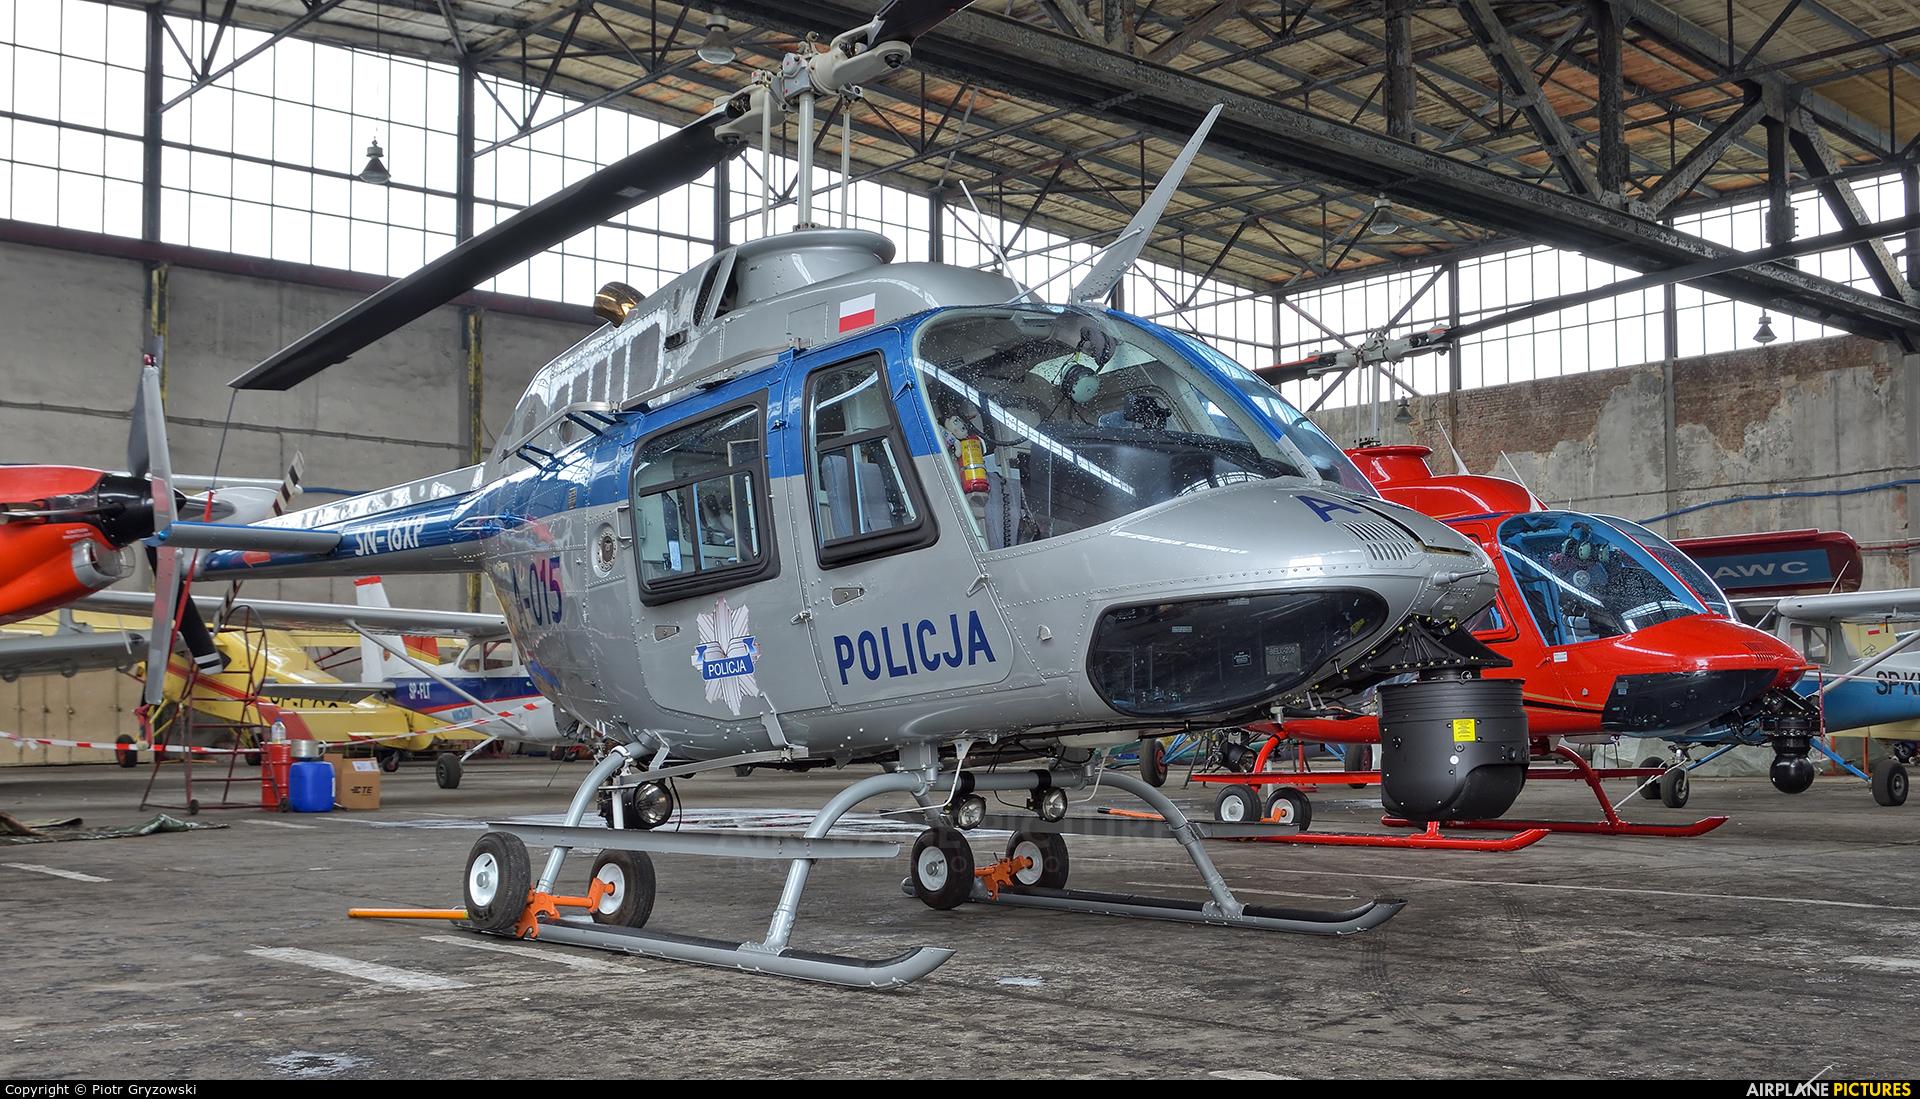 Poland - Police SN-16XP aircraft at Gliwice